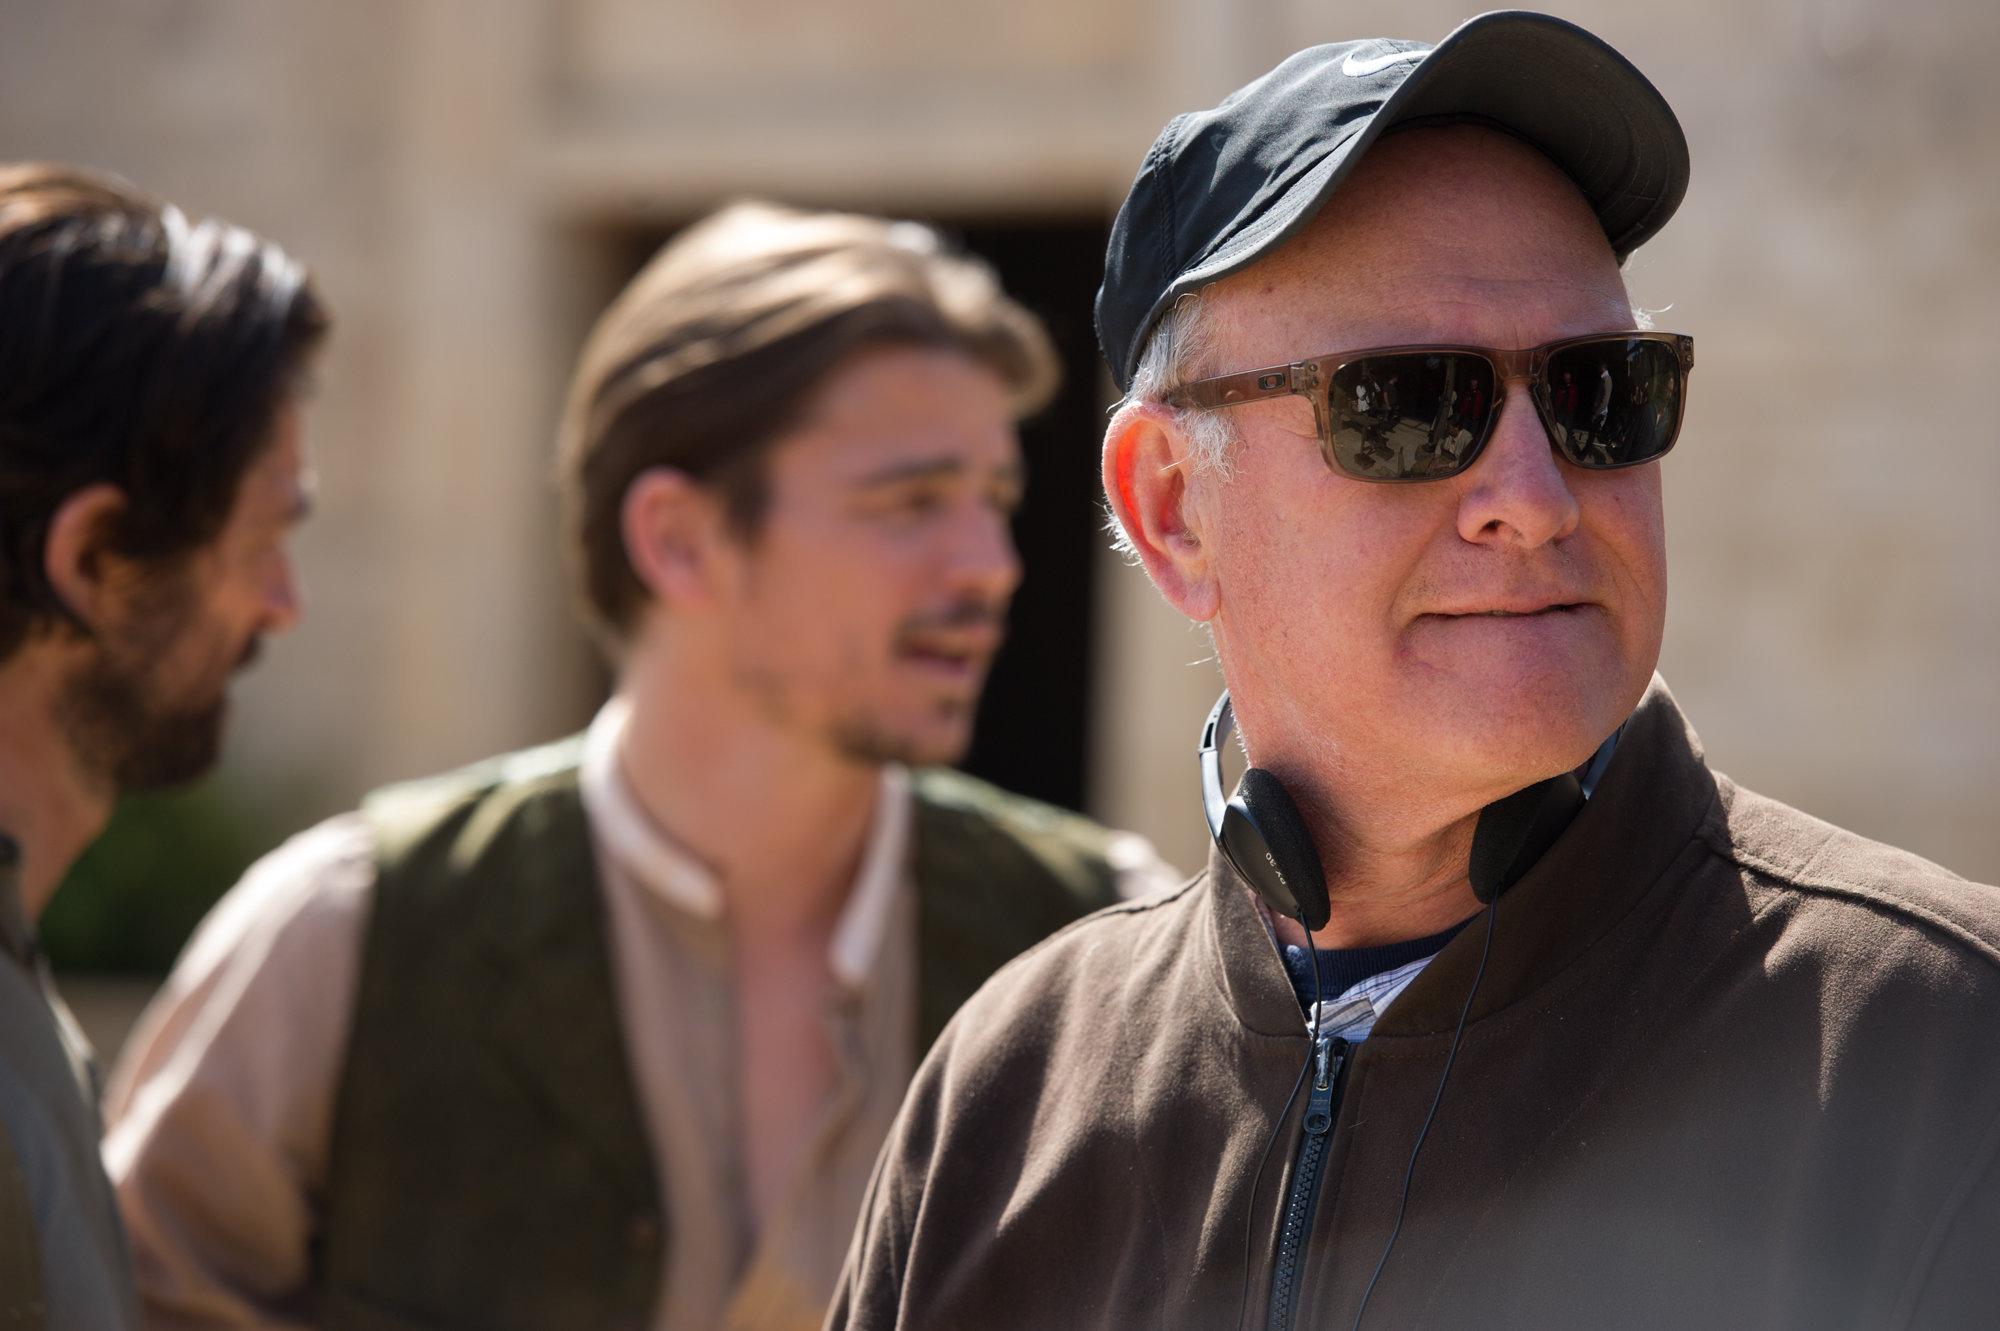 Director Joseph Ruben